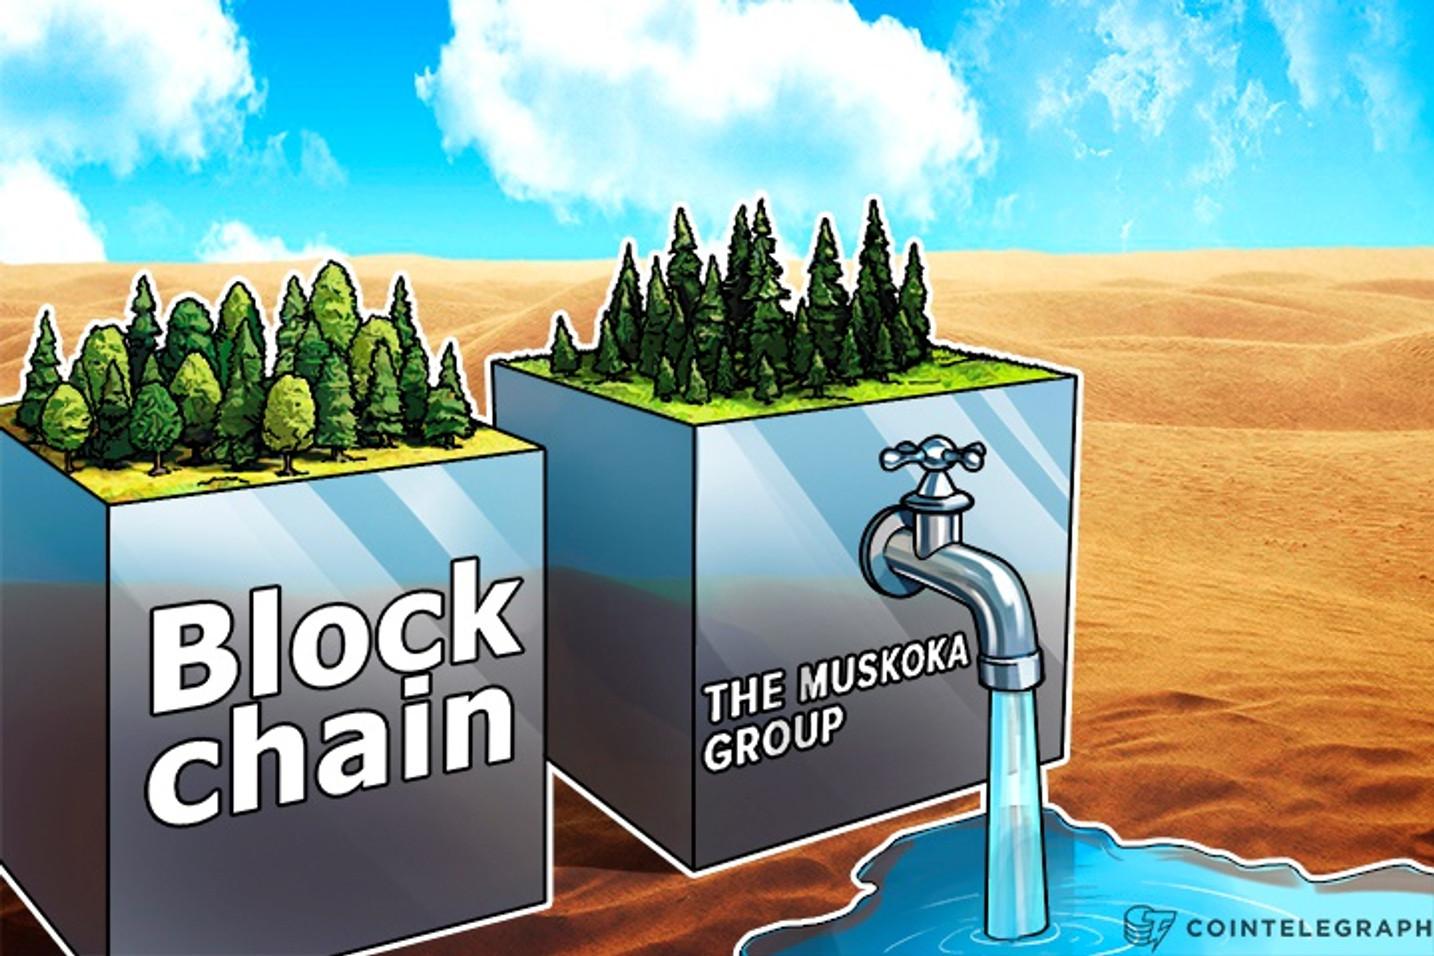 Blockchain's Backers Set to Improve its Image,  Form Muskoka Group